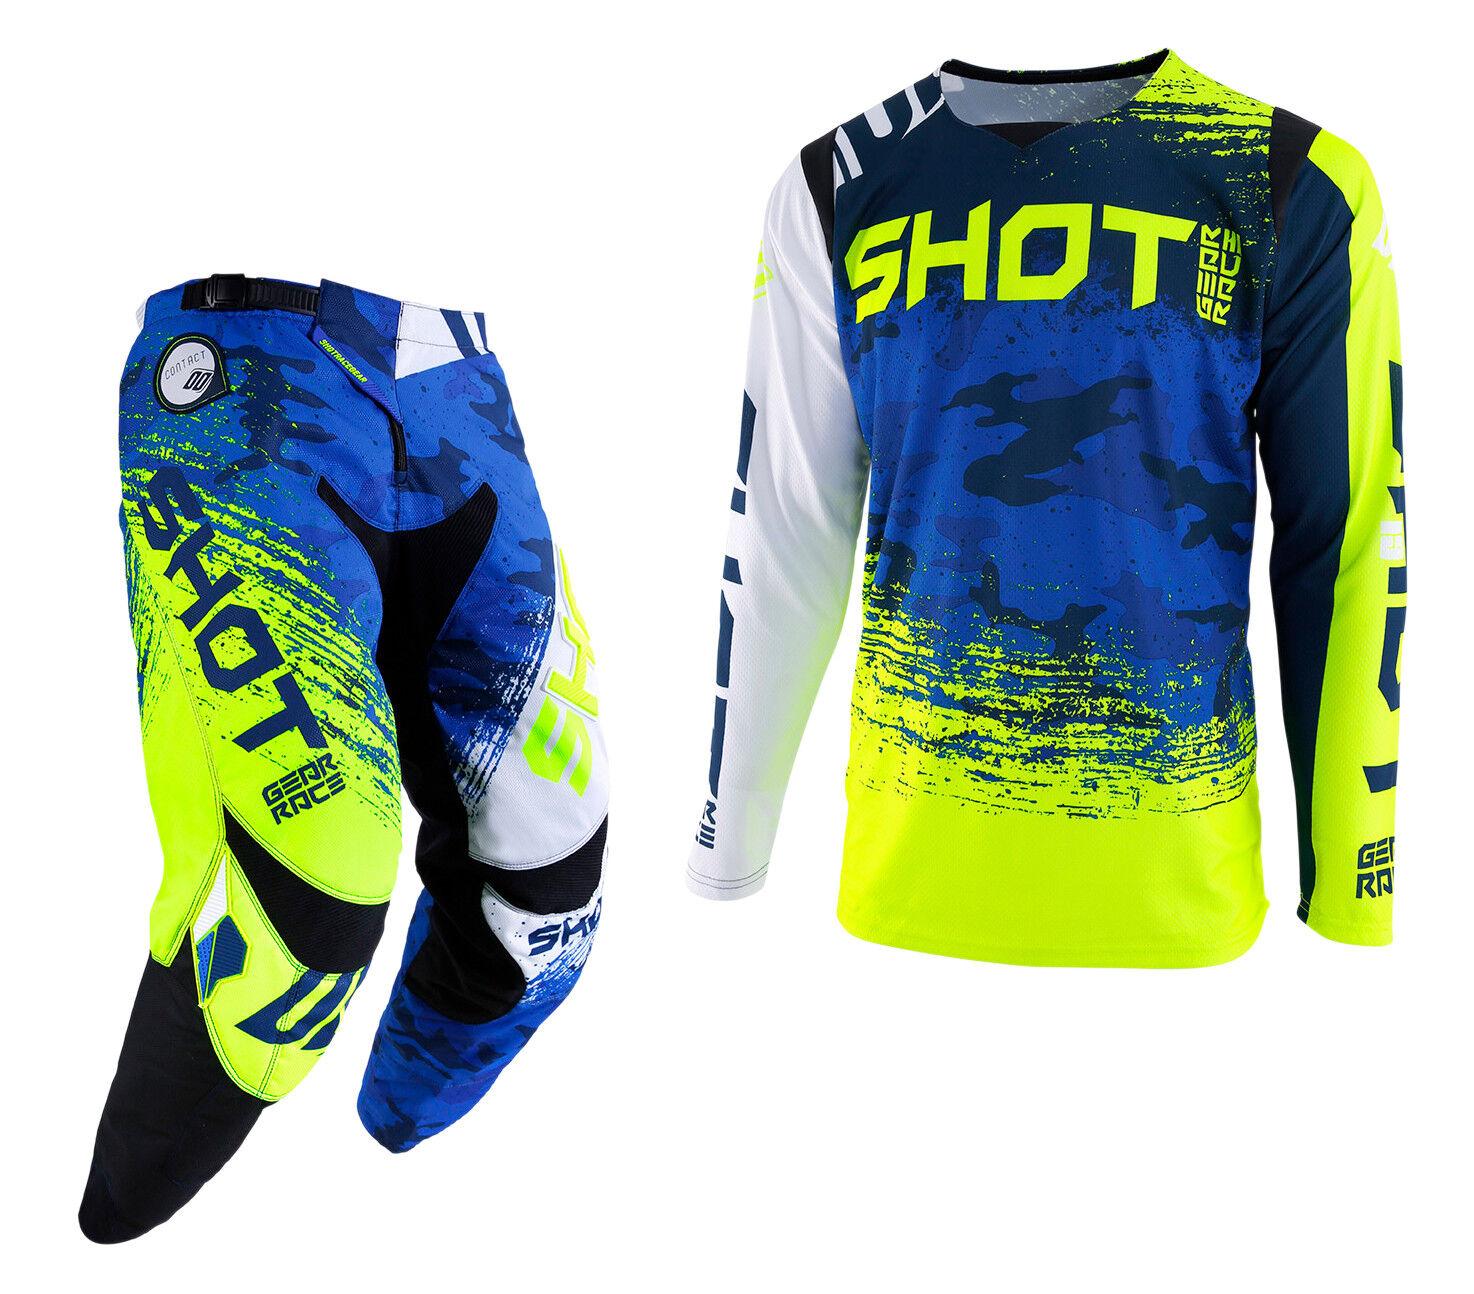 2019 SHOT COUNTER PANT & JERSEY MTB BMX DOWNHILL DH DH DOWNHILL COMBO KIT CAMO Blau Gelb 6e1431